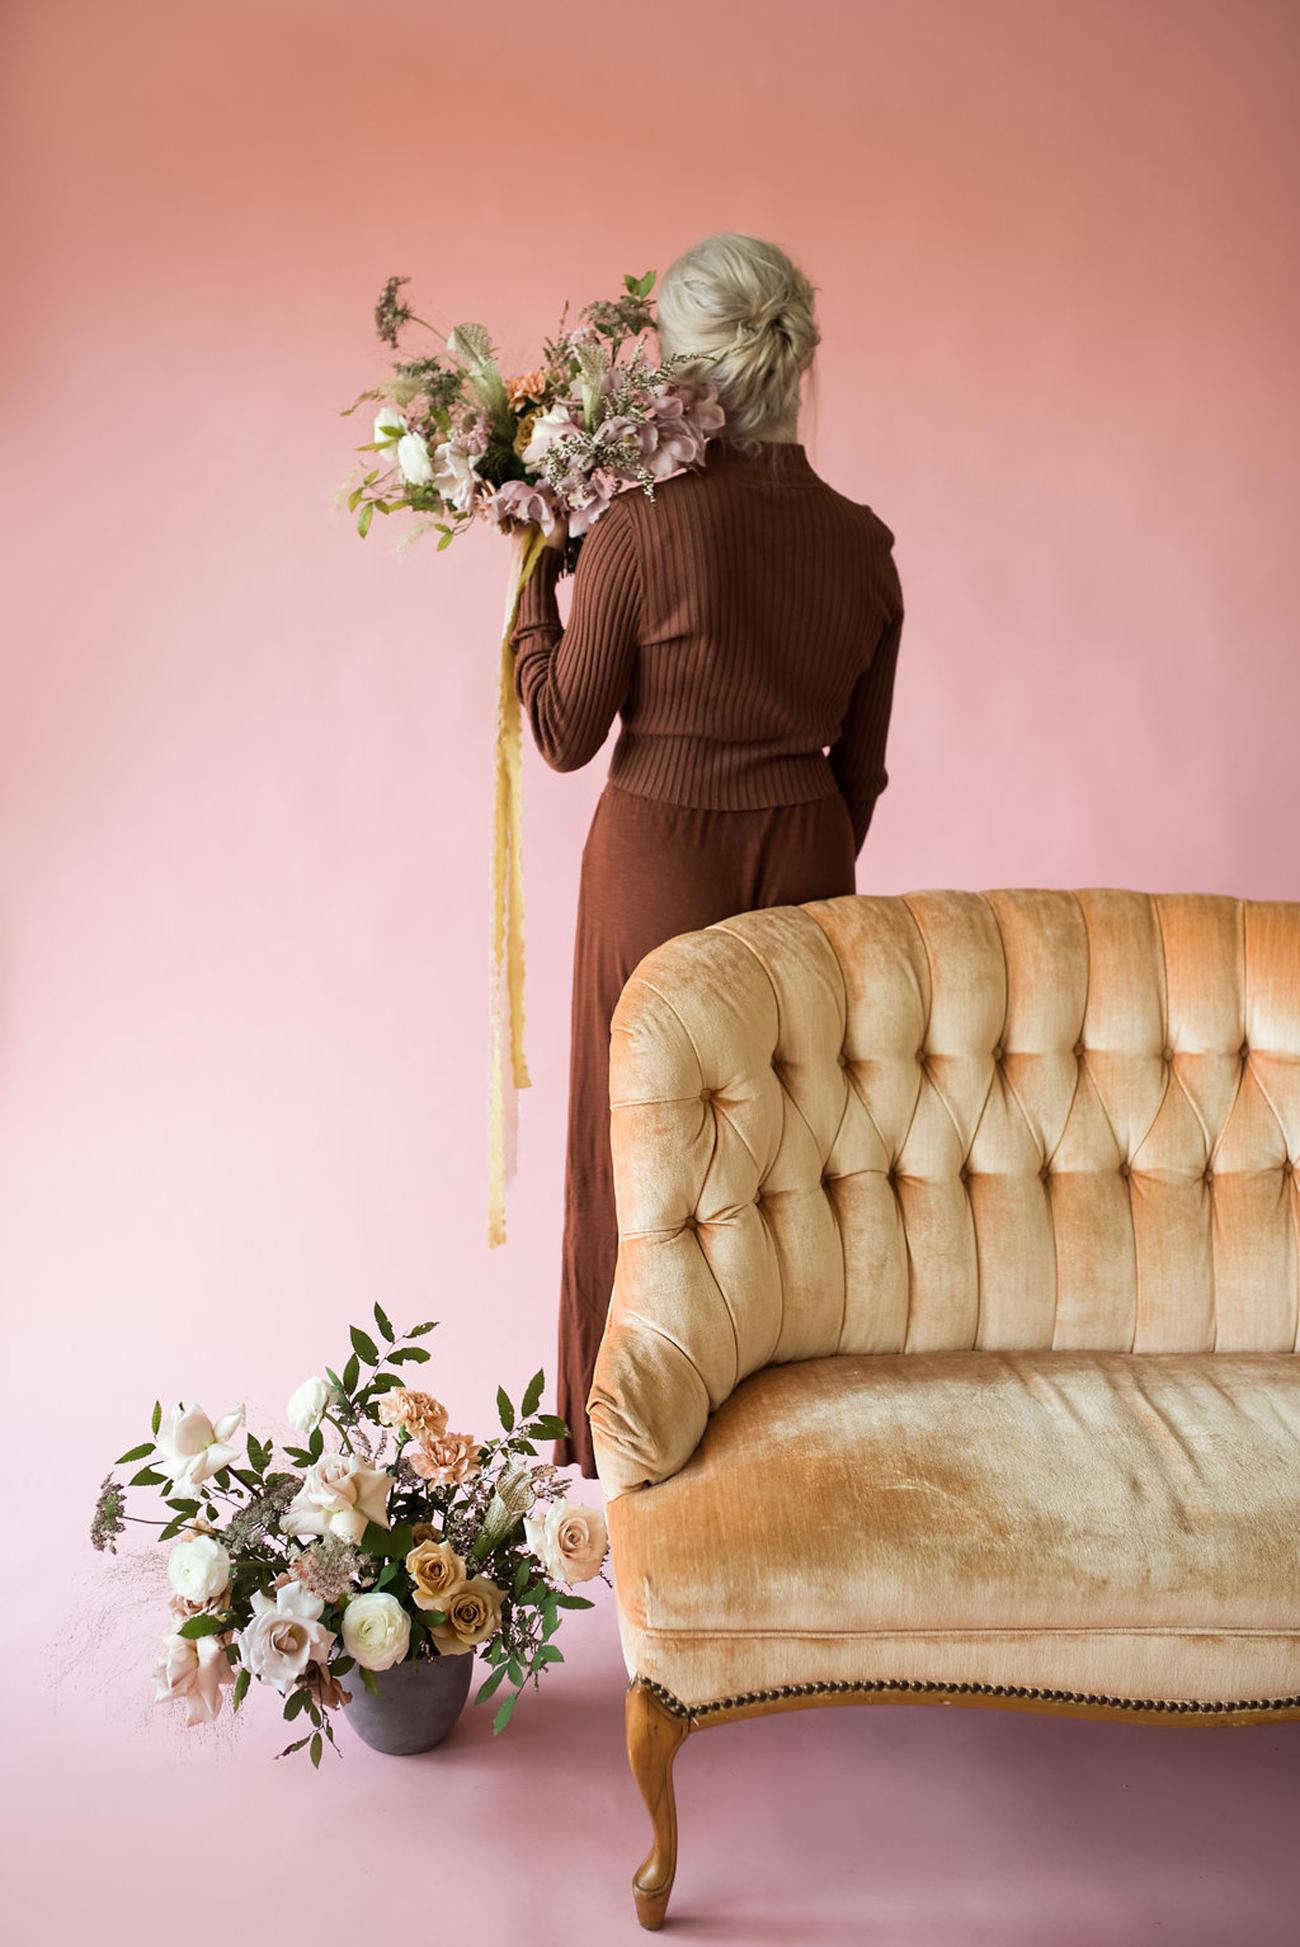 la-vintage-rentals-tulsa-ok-anthousai-floral-design-04.jpg